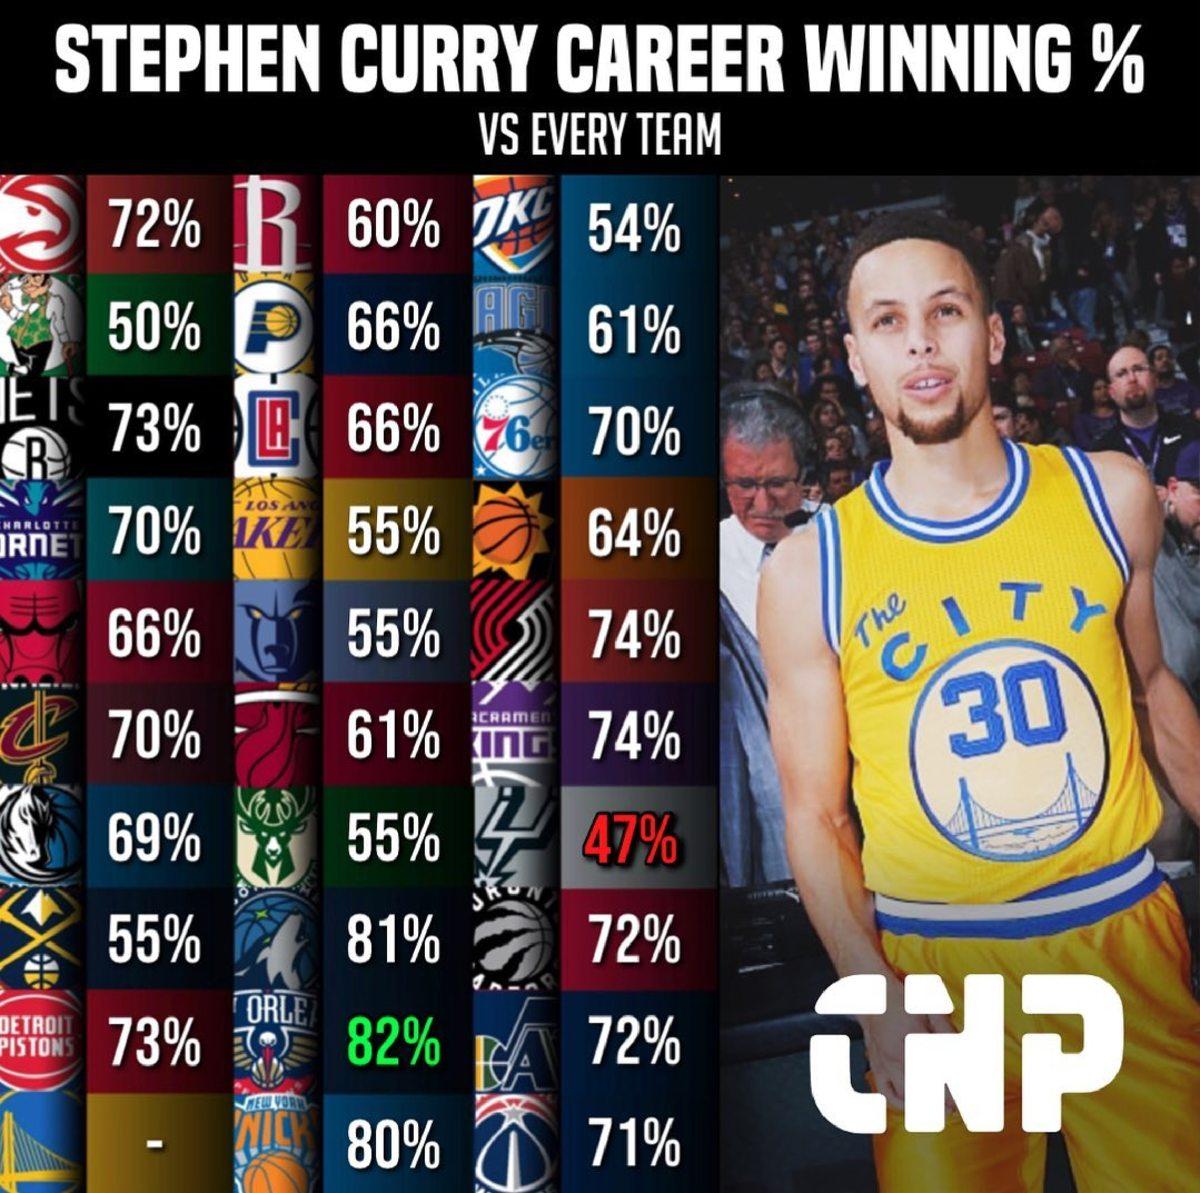 Stephen Curry Career Winning %